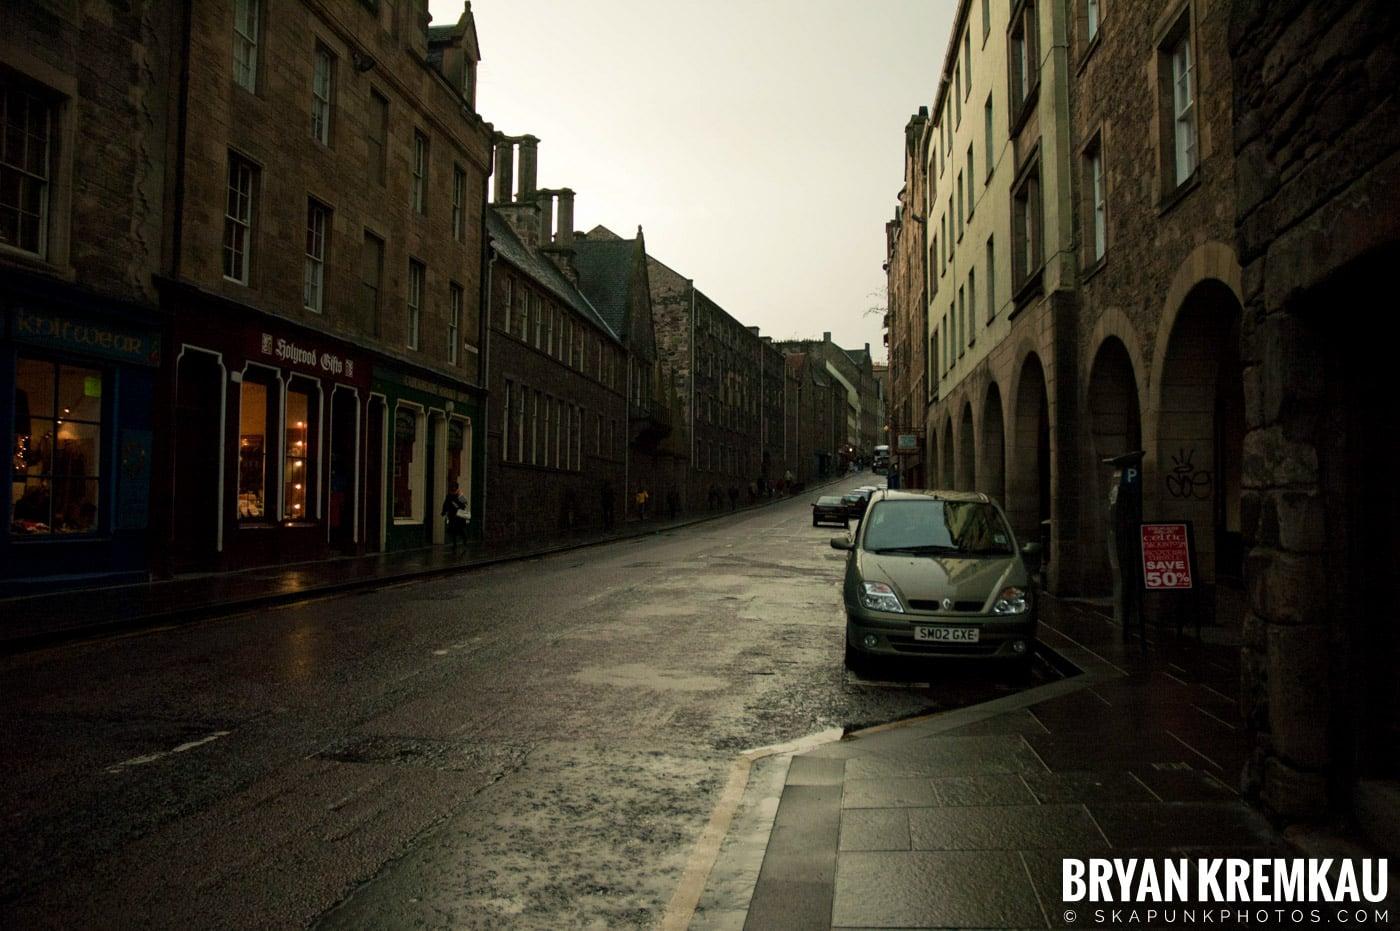 Edinburgh, Scotland - Day 1 - 12.12.06 (25)